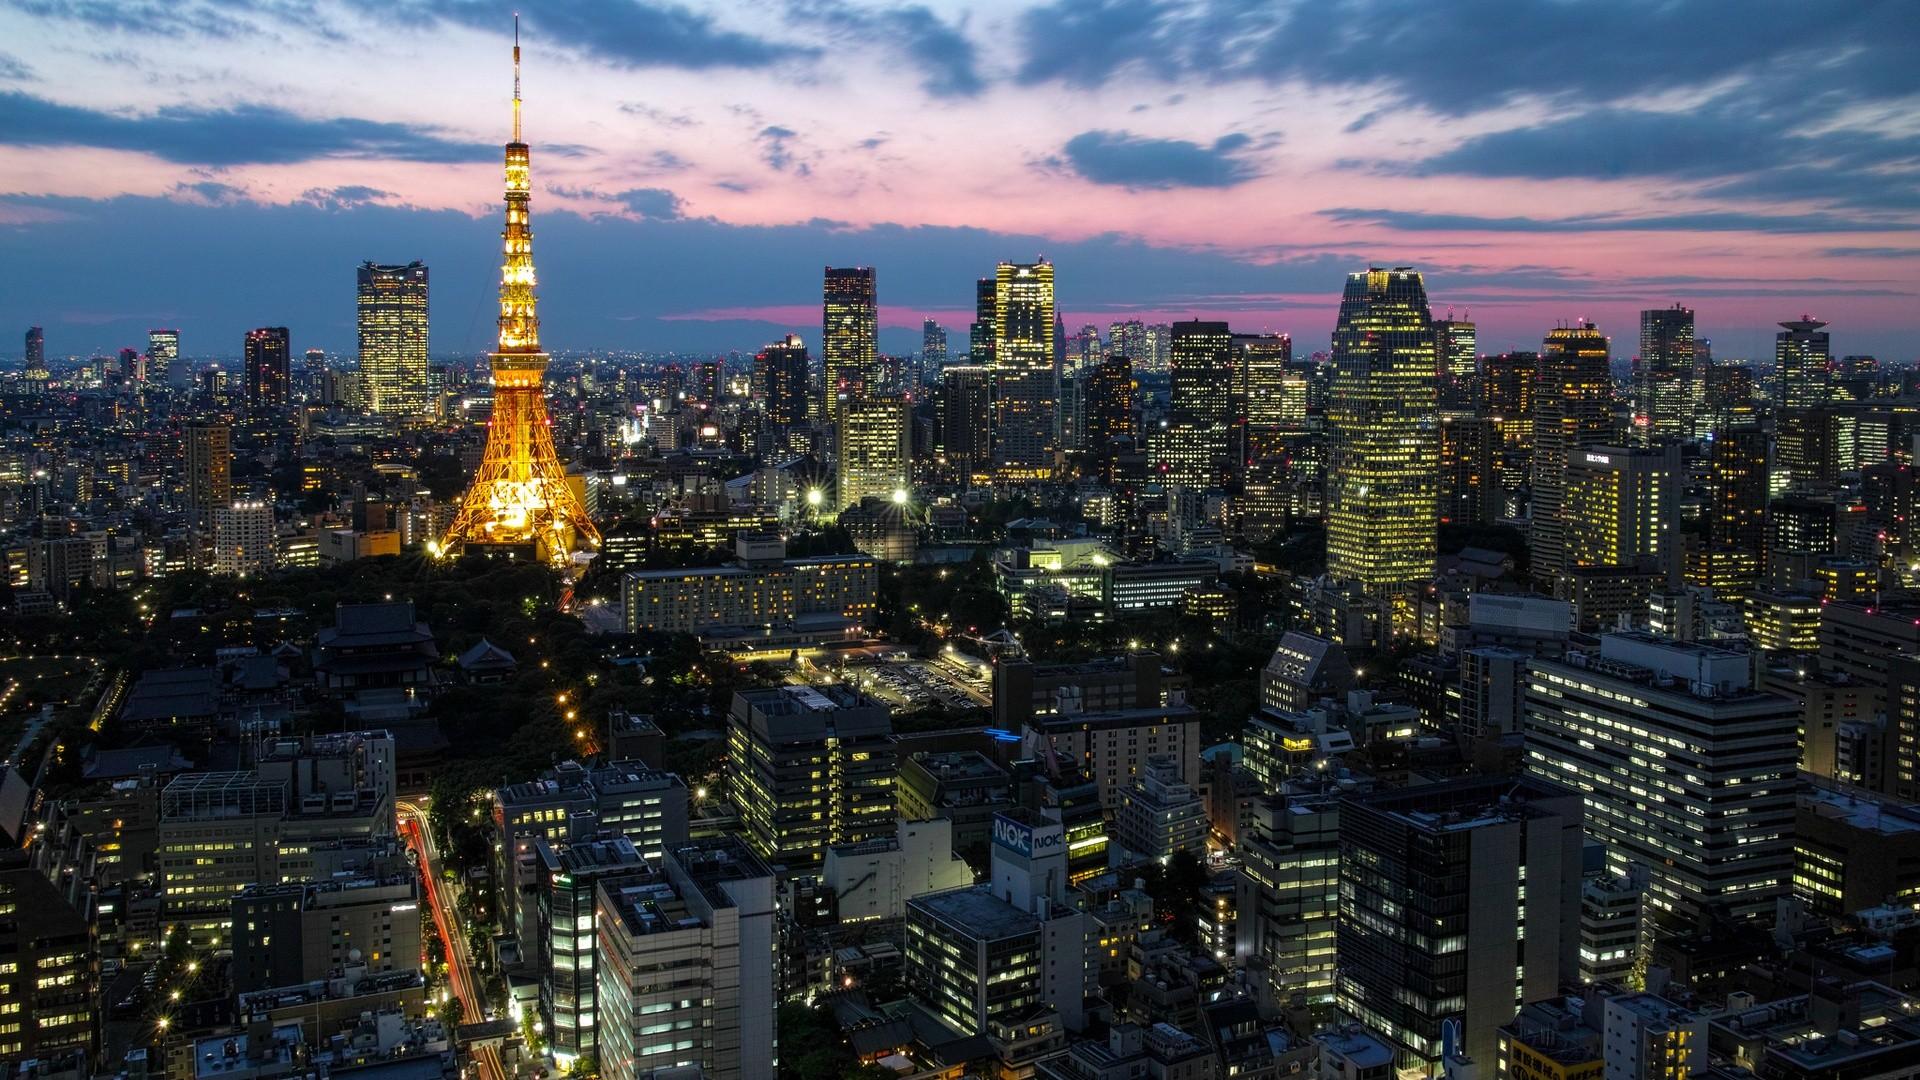 Tokyo City   HD Wallpaper SoloSfondicom 1920x1080